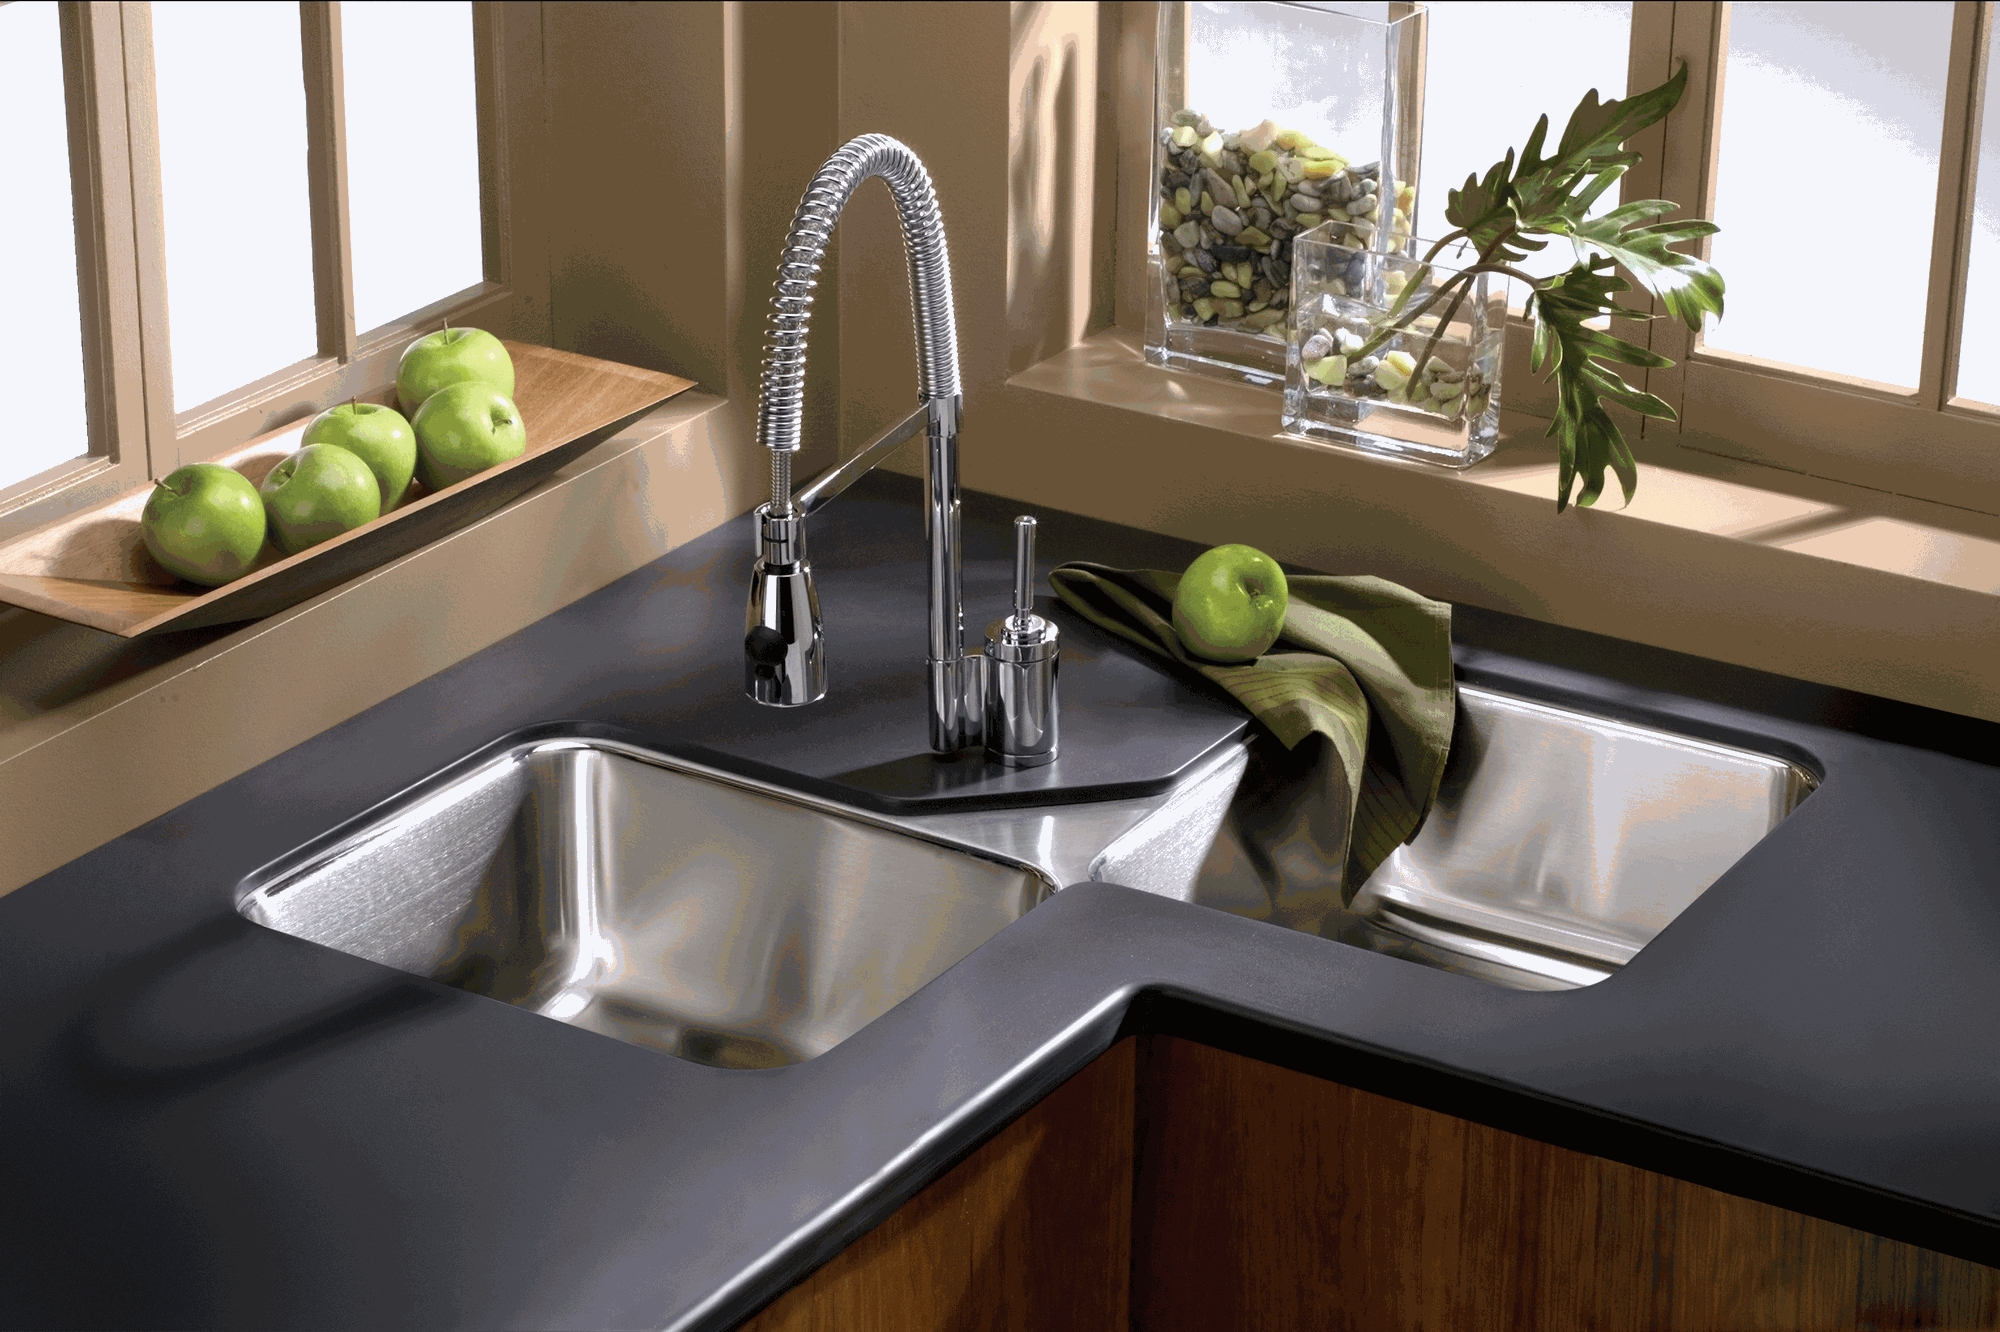 Ideas, best faucet for small kitchen sink best faucet for small kitchen sink best modern kitchen sink faucets decor fl09xa 142 2000 x 1332  .